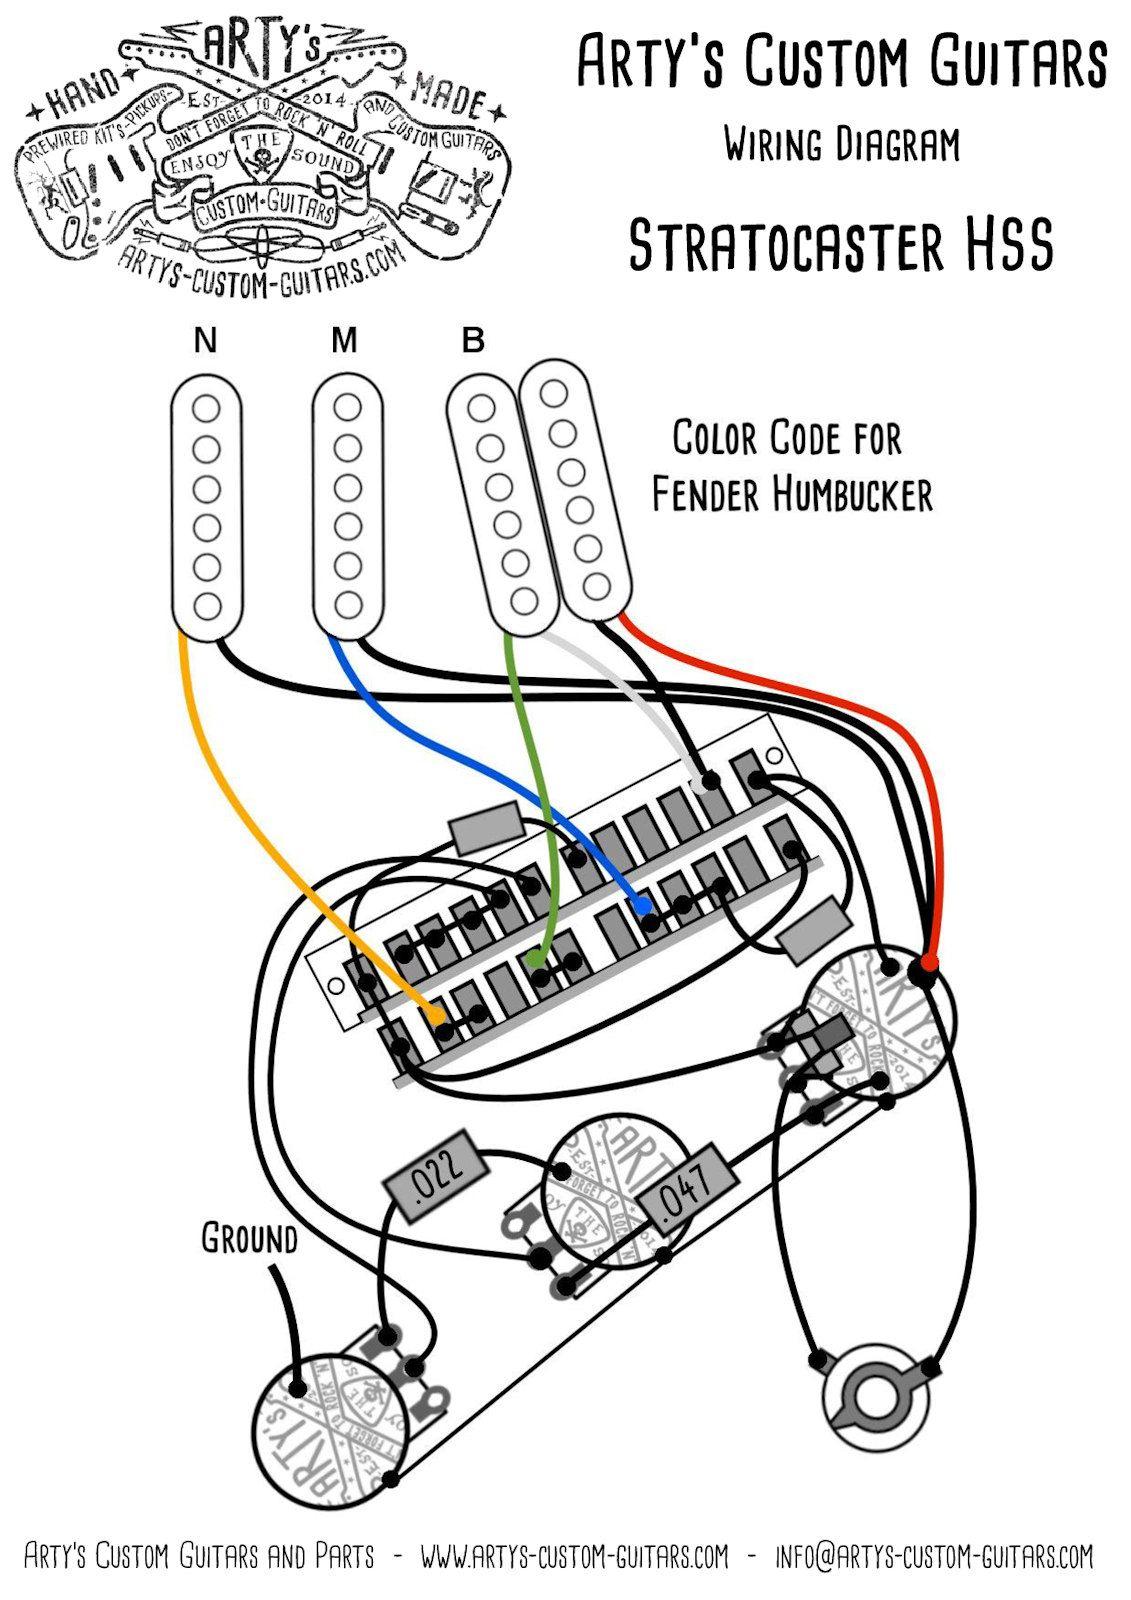 Fender Hss Wiring Diagram - Wiring Diagram Blog - Fender Hss Wiring Diagram